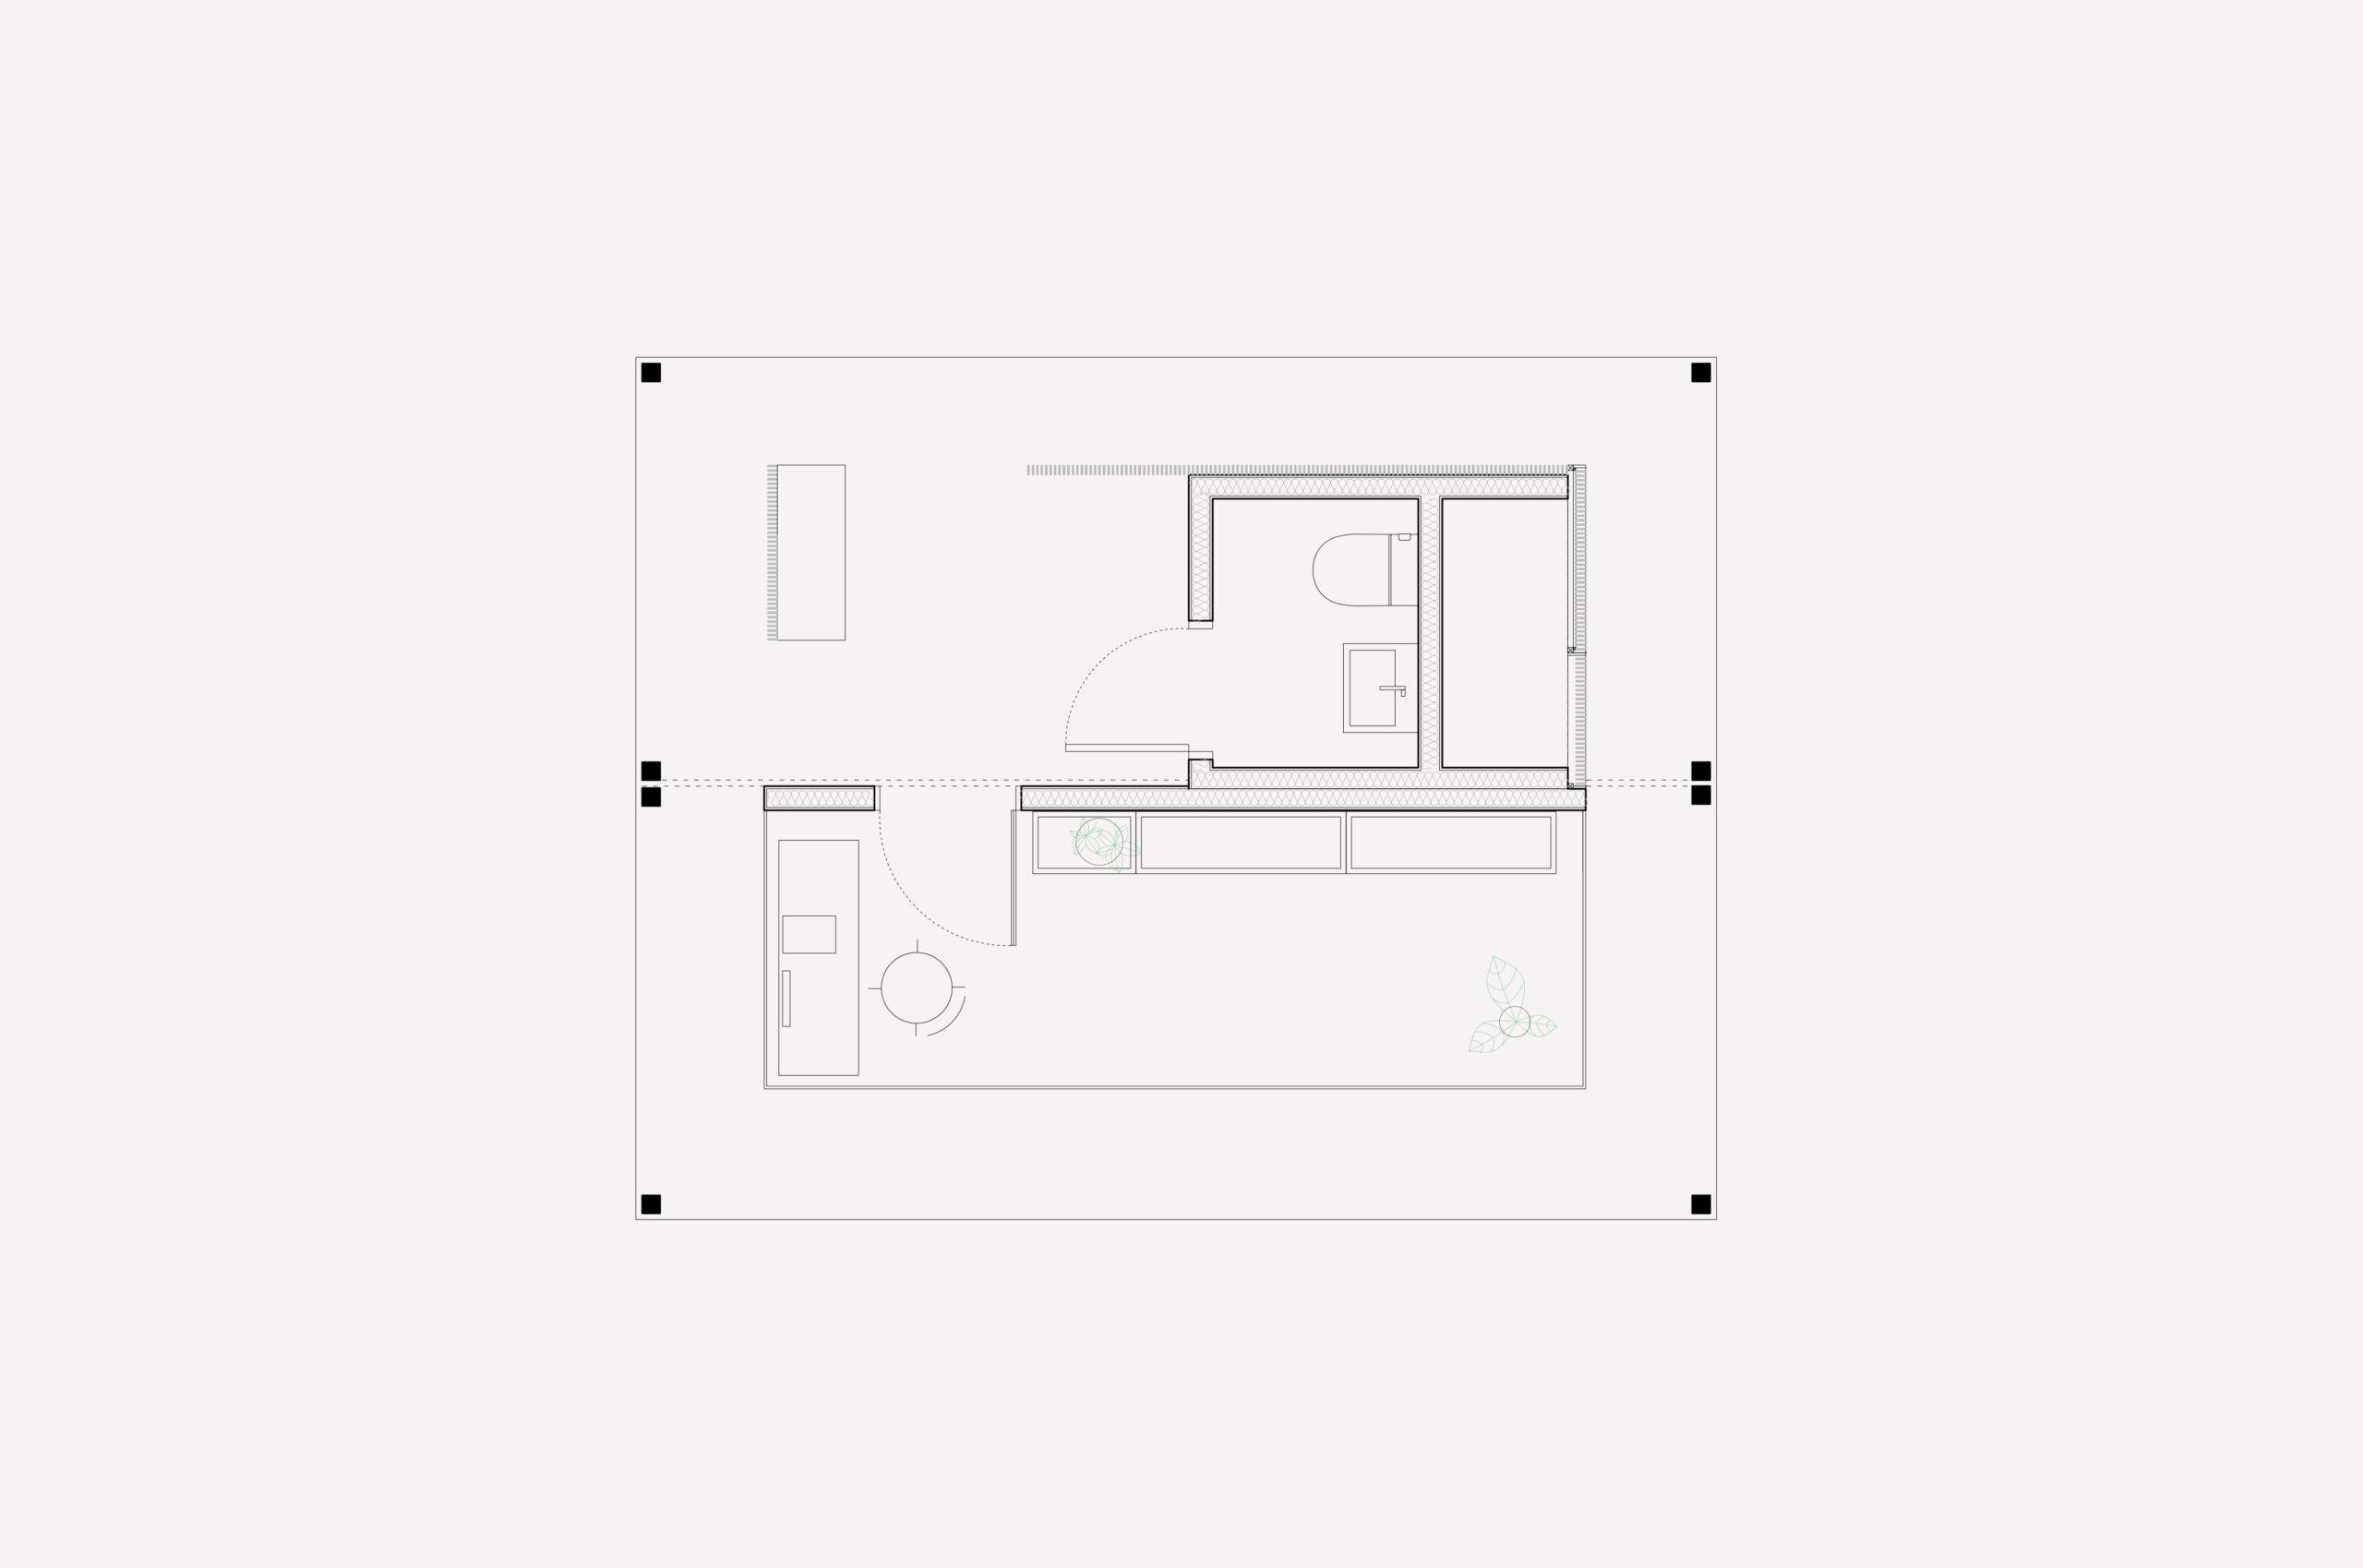 Plano_garita_vigilancia